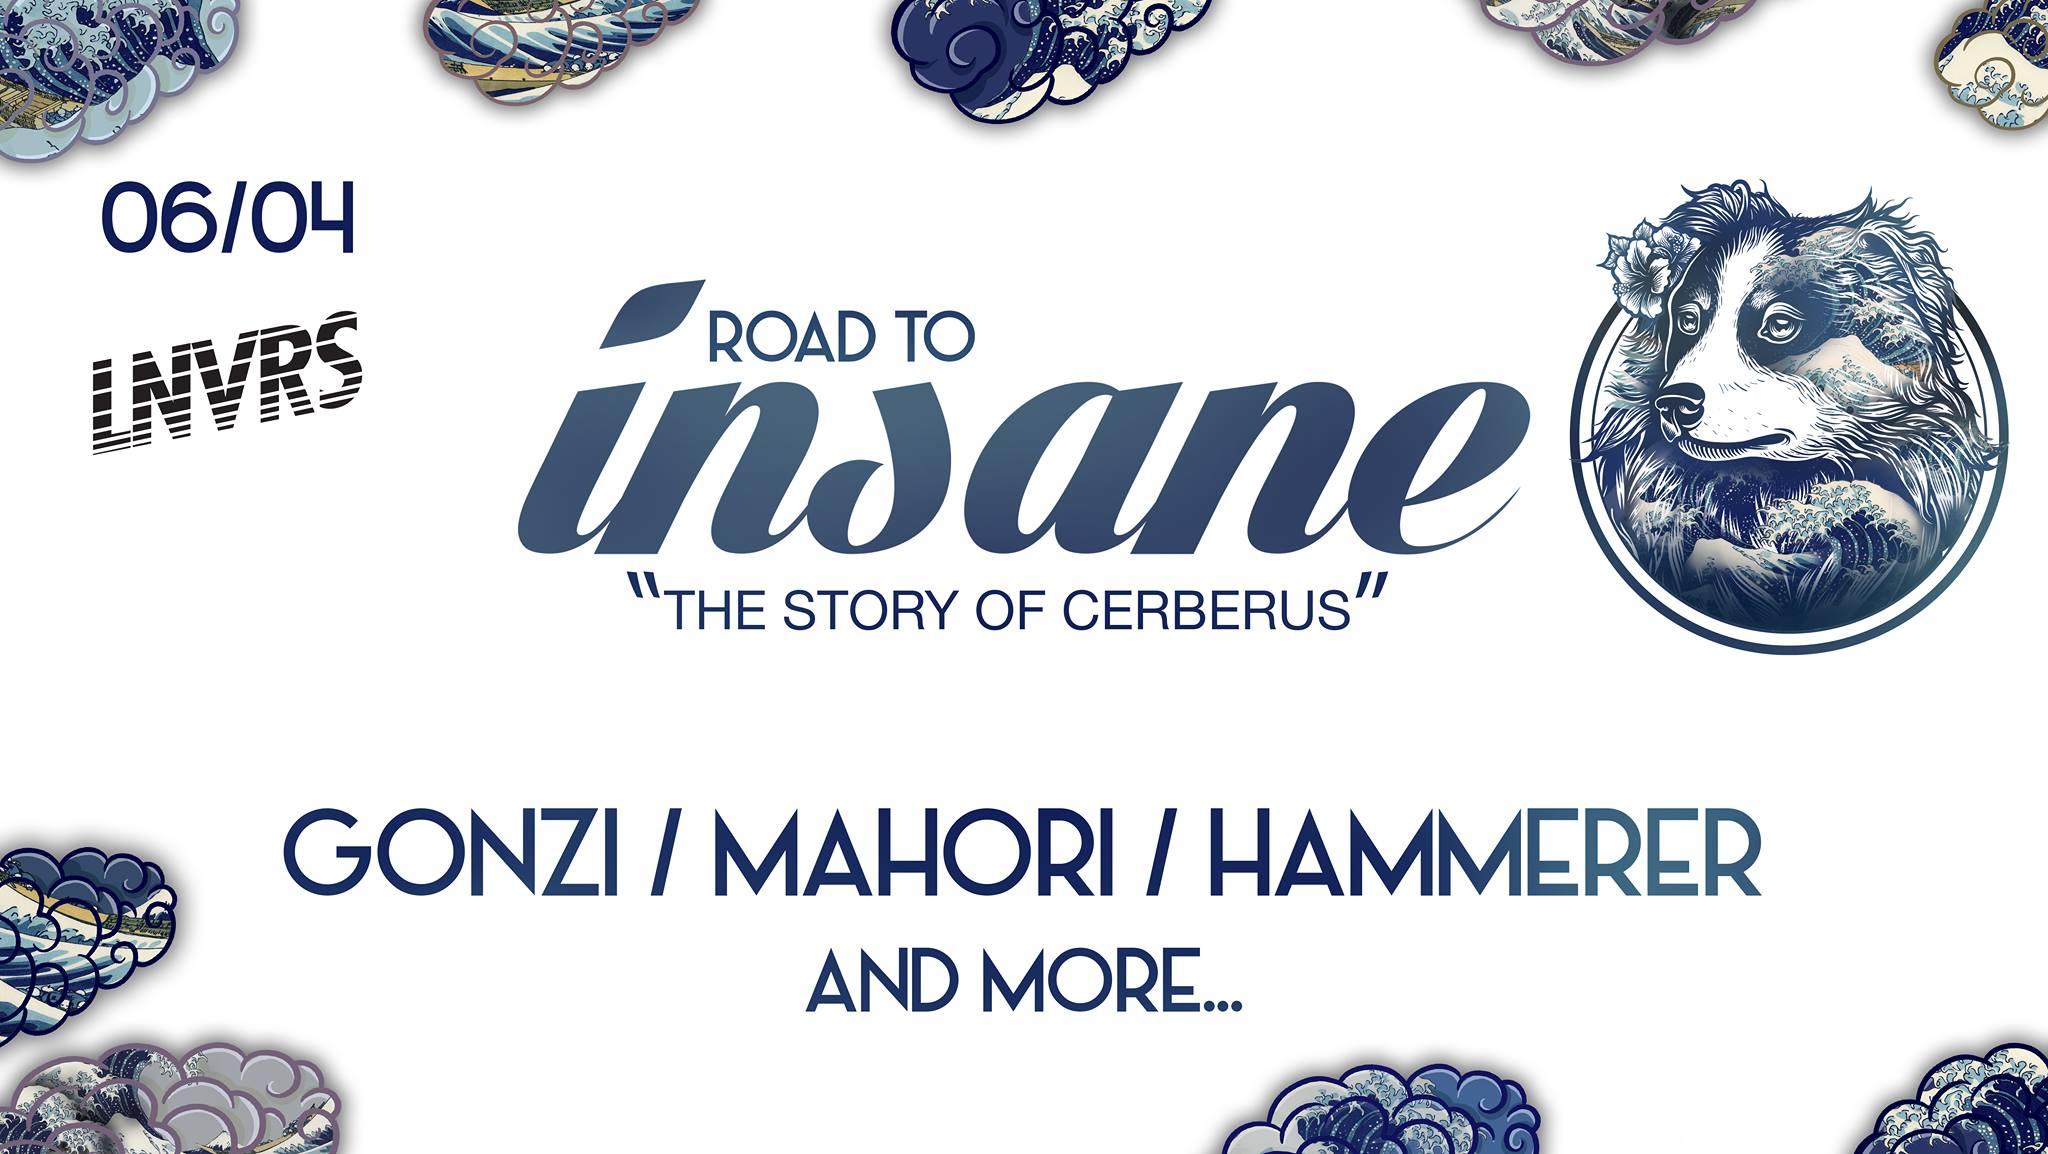 Road To Insane w/ Gonzi, Mahori, Hammerer & More - L'Envers